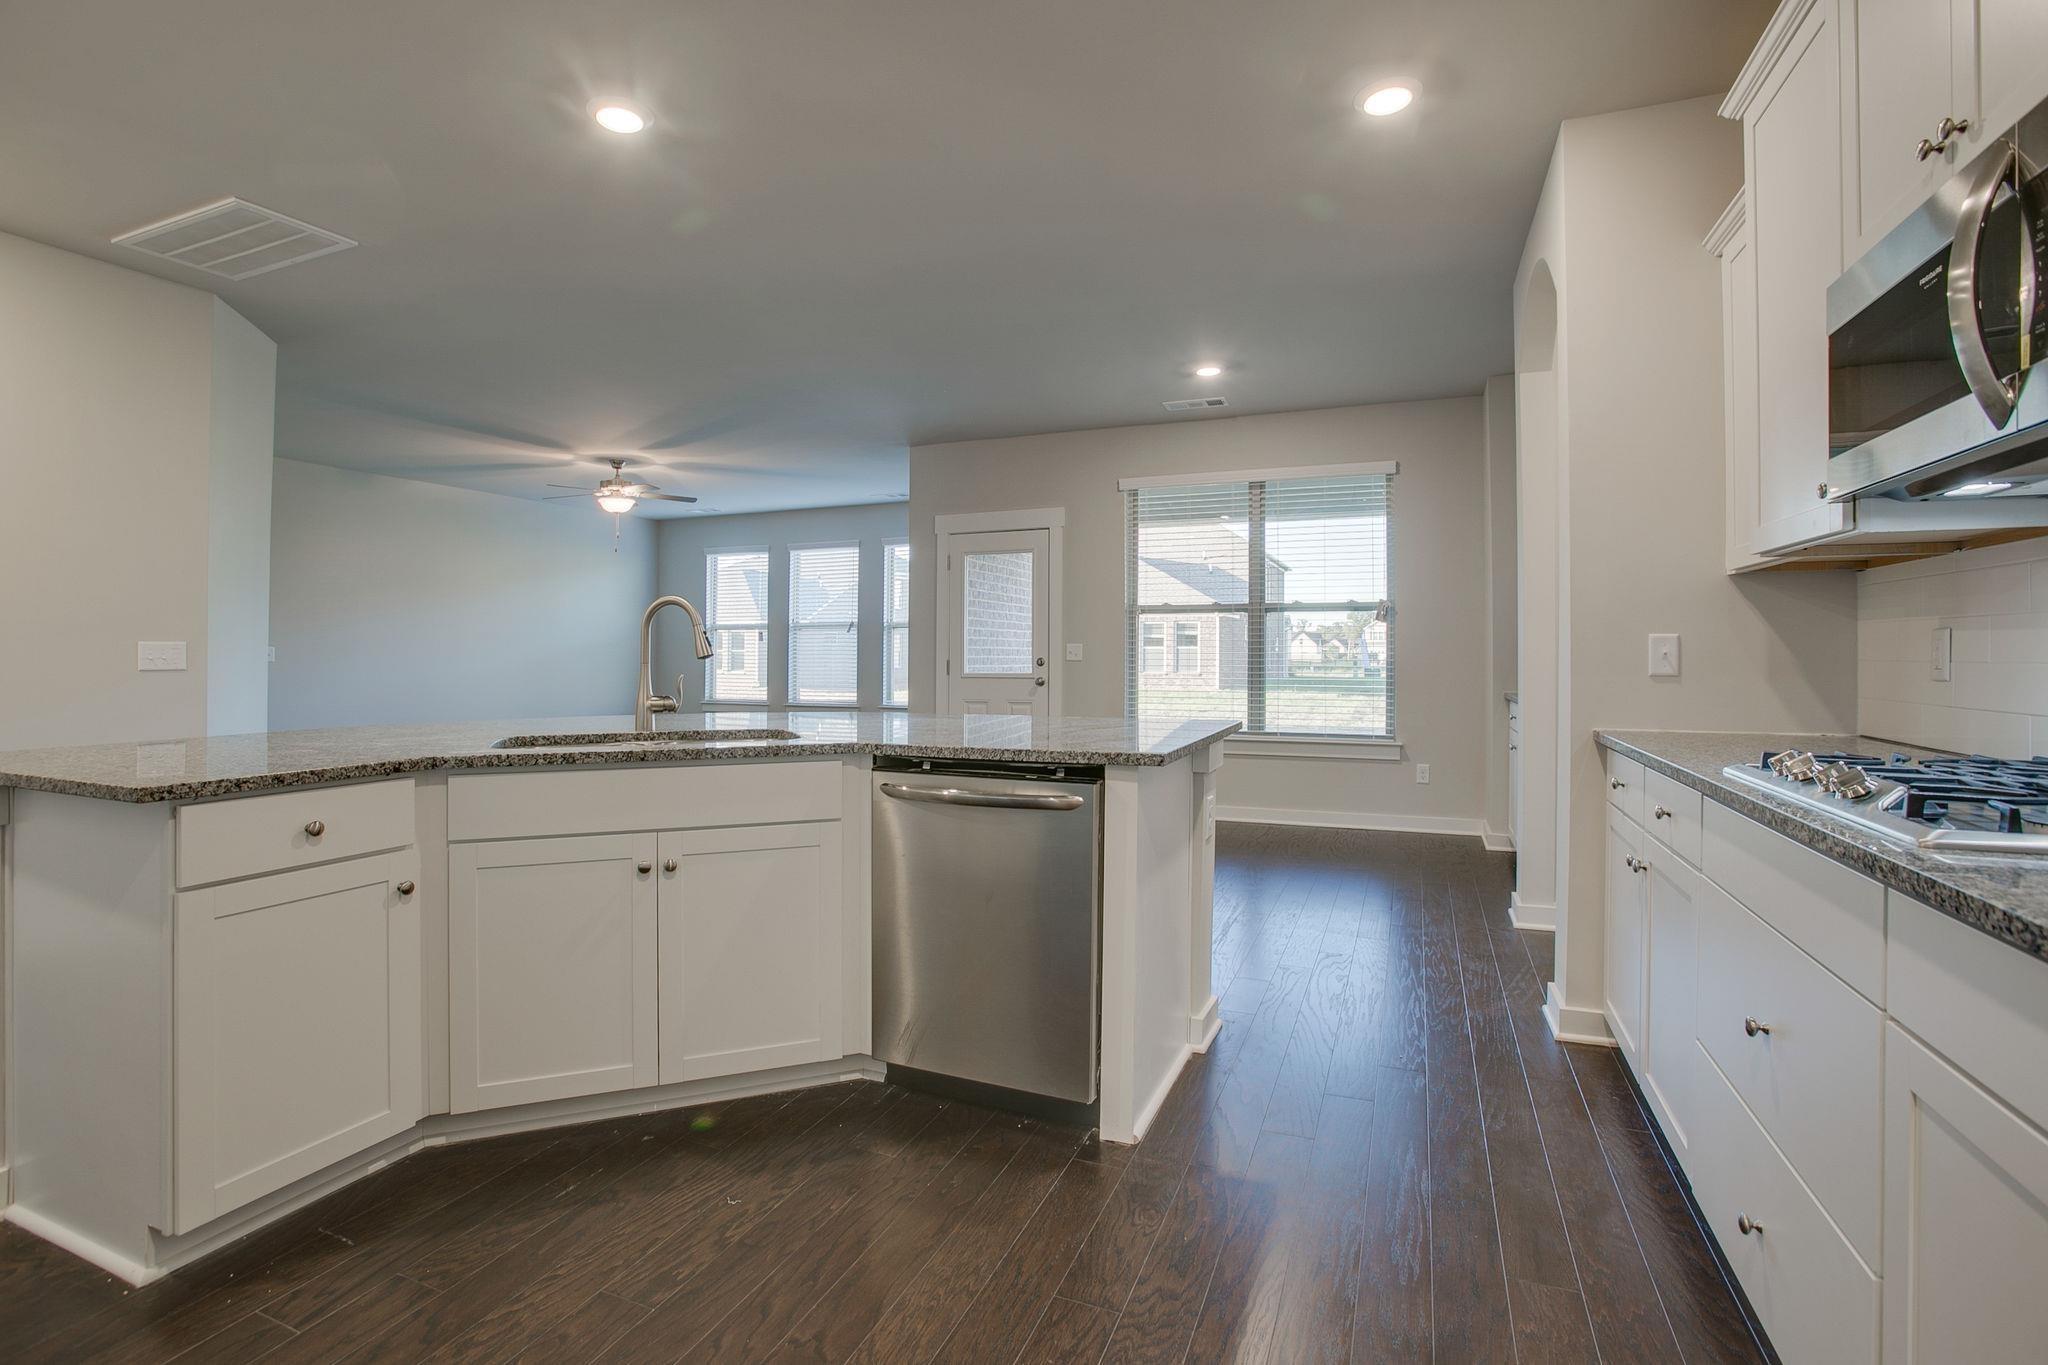 4730 Lapis Lane- Lot 225o, Murfreesboro, TN 37128 - Murfreesboro, TN real estate listing